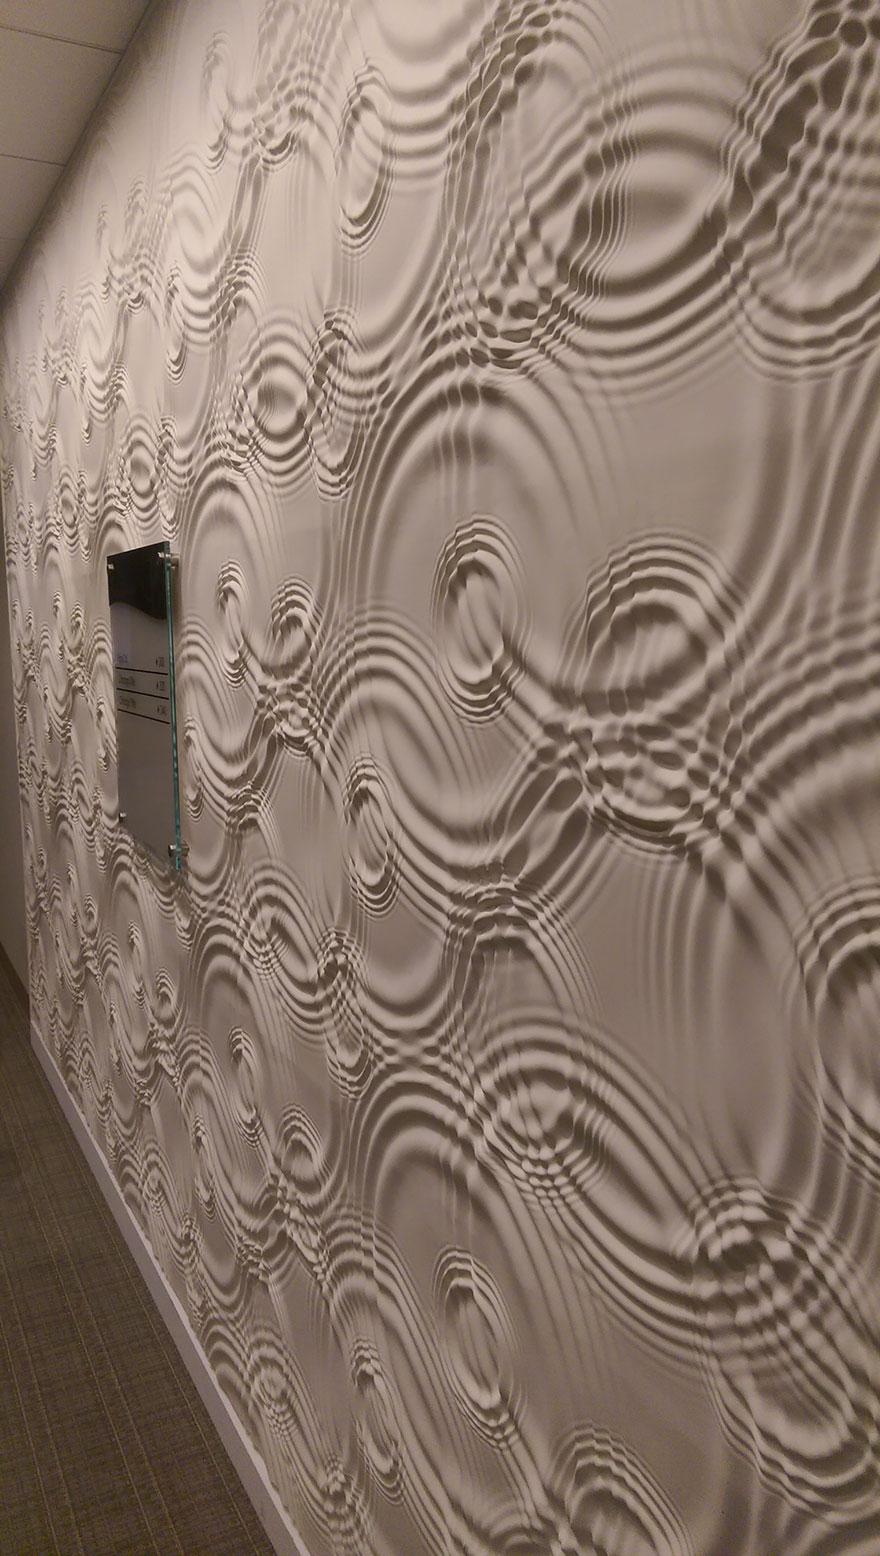 pared con ondas liquidas